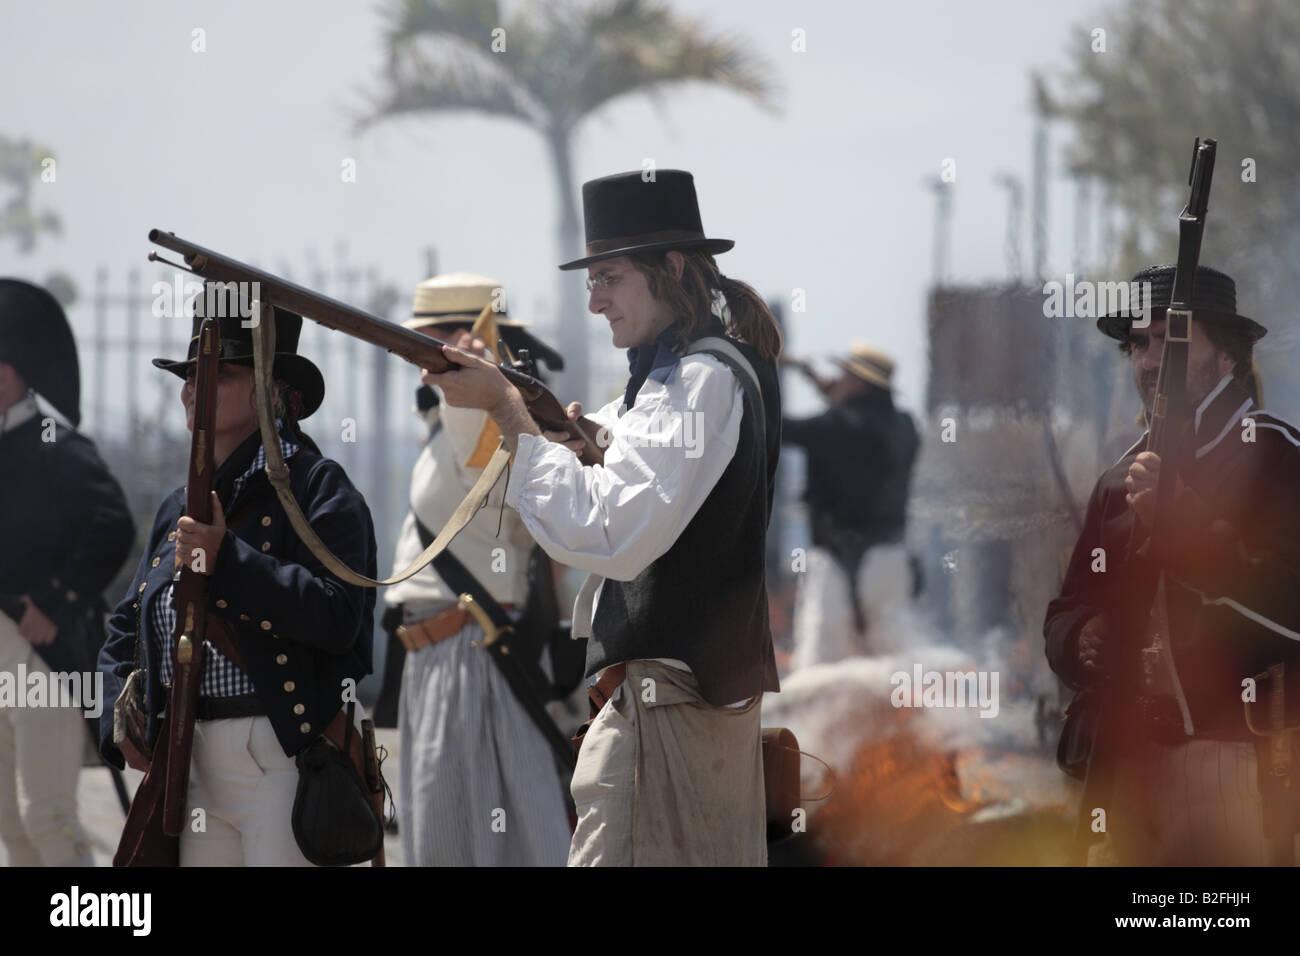 A British Navy sailor loading his rifle during a reenactment of the 1797 battle of Santa Cruz, Tenerife Stock Photo